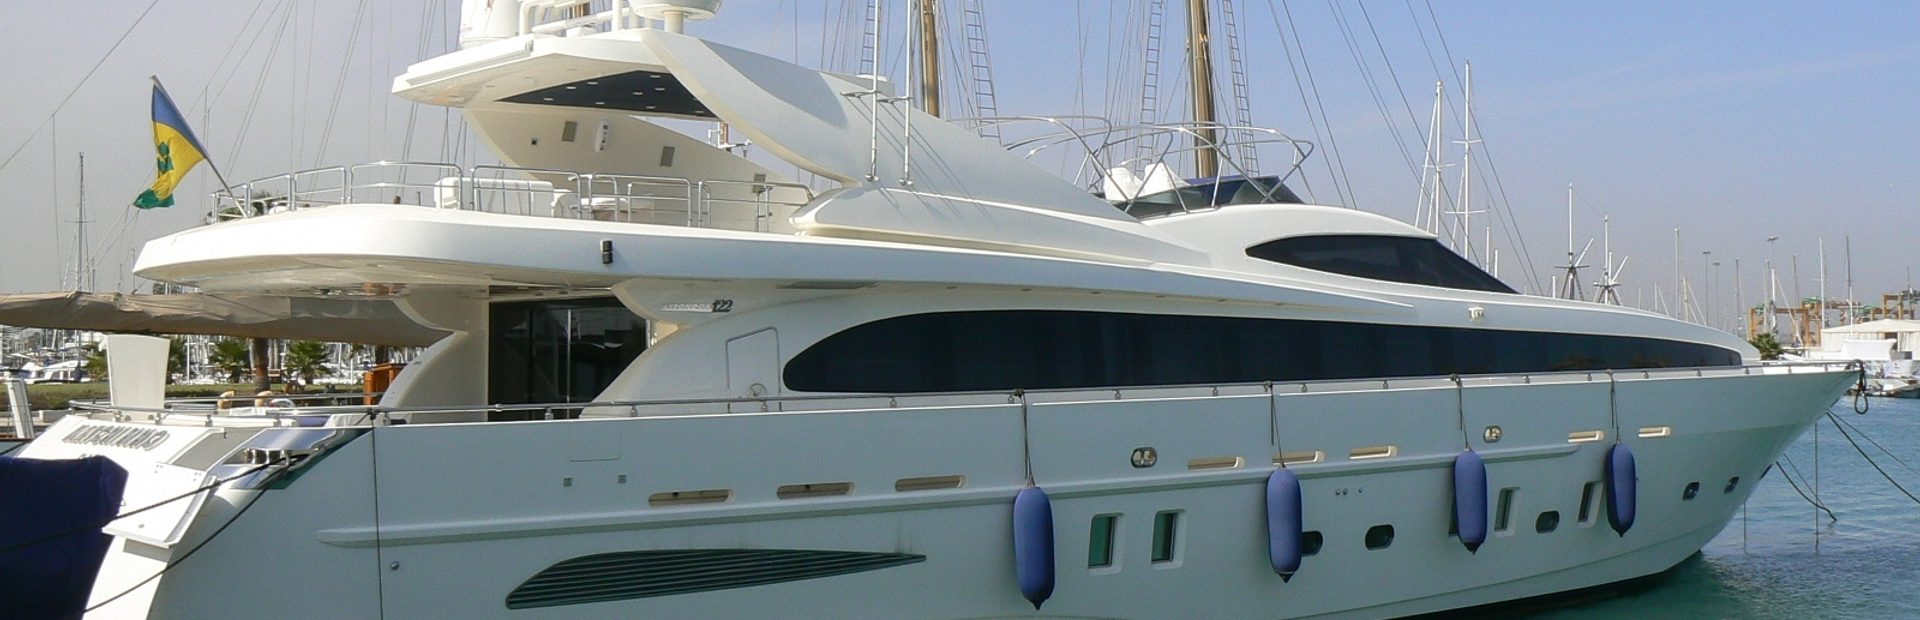 114 GLX Yacht Charter